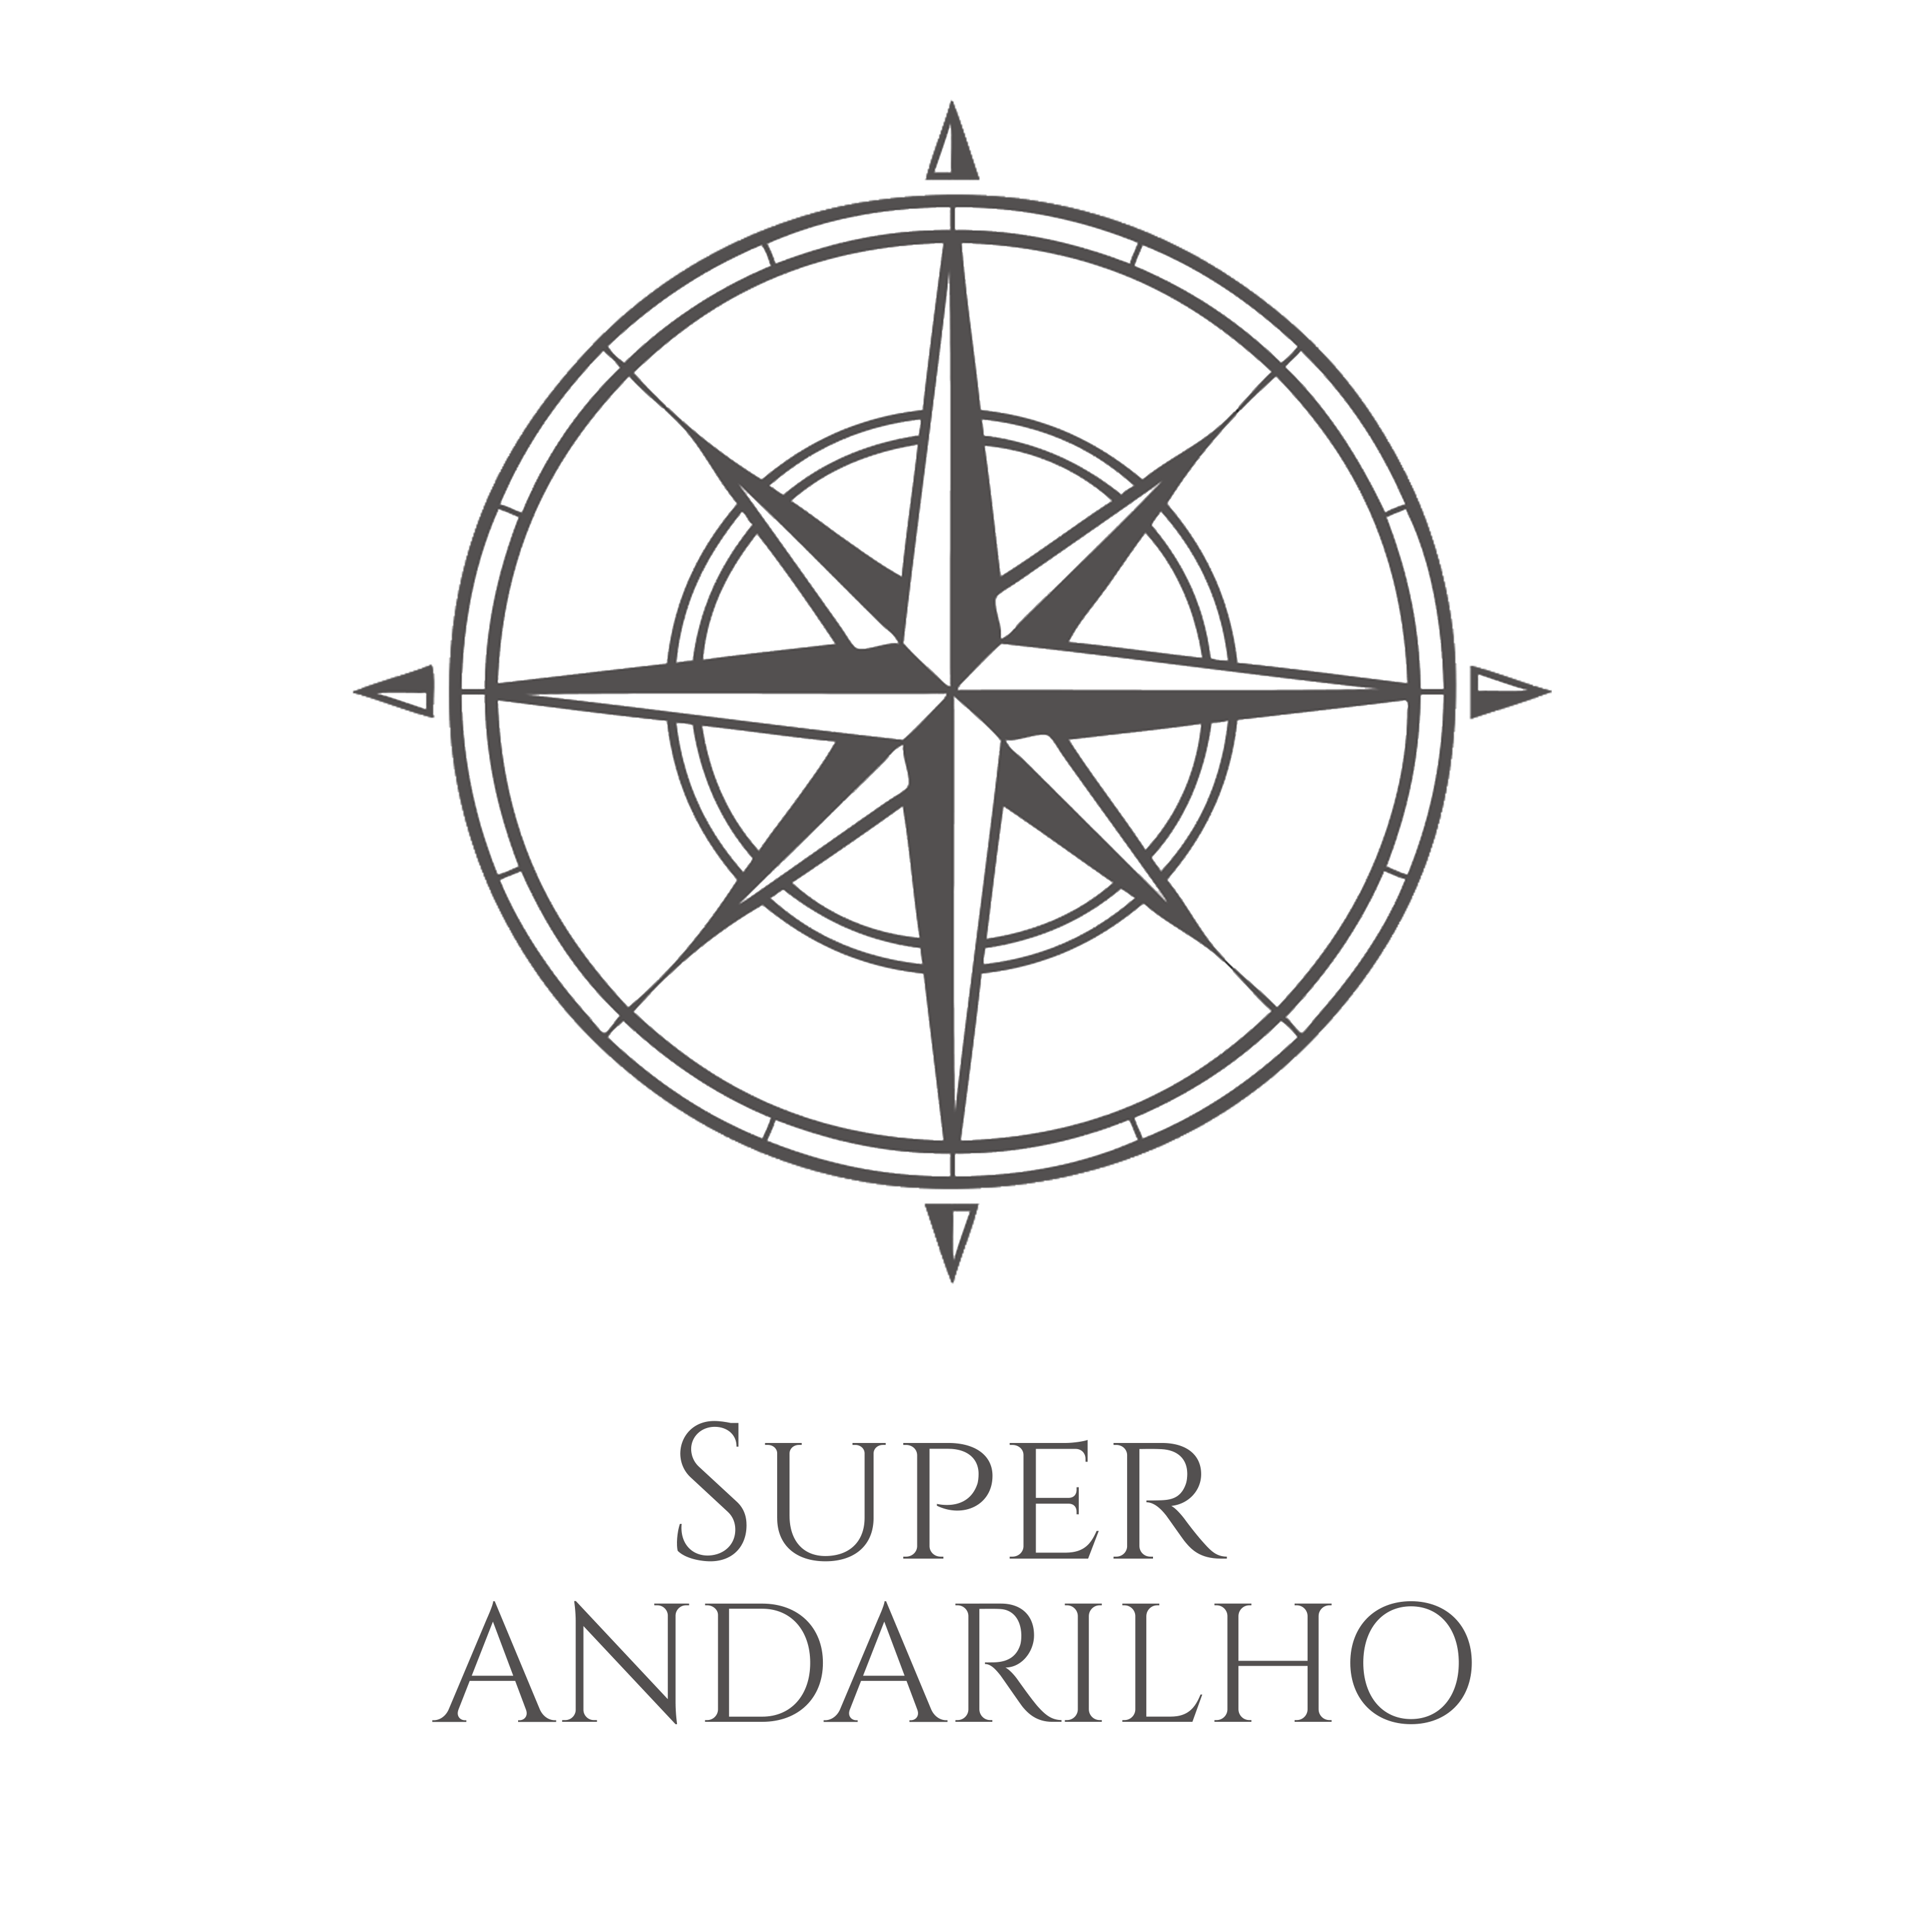 SuperANDARILHO